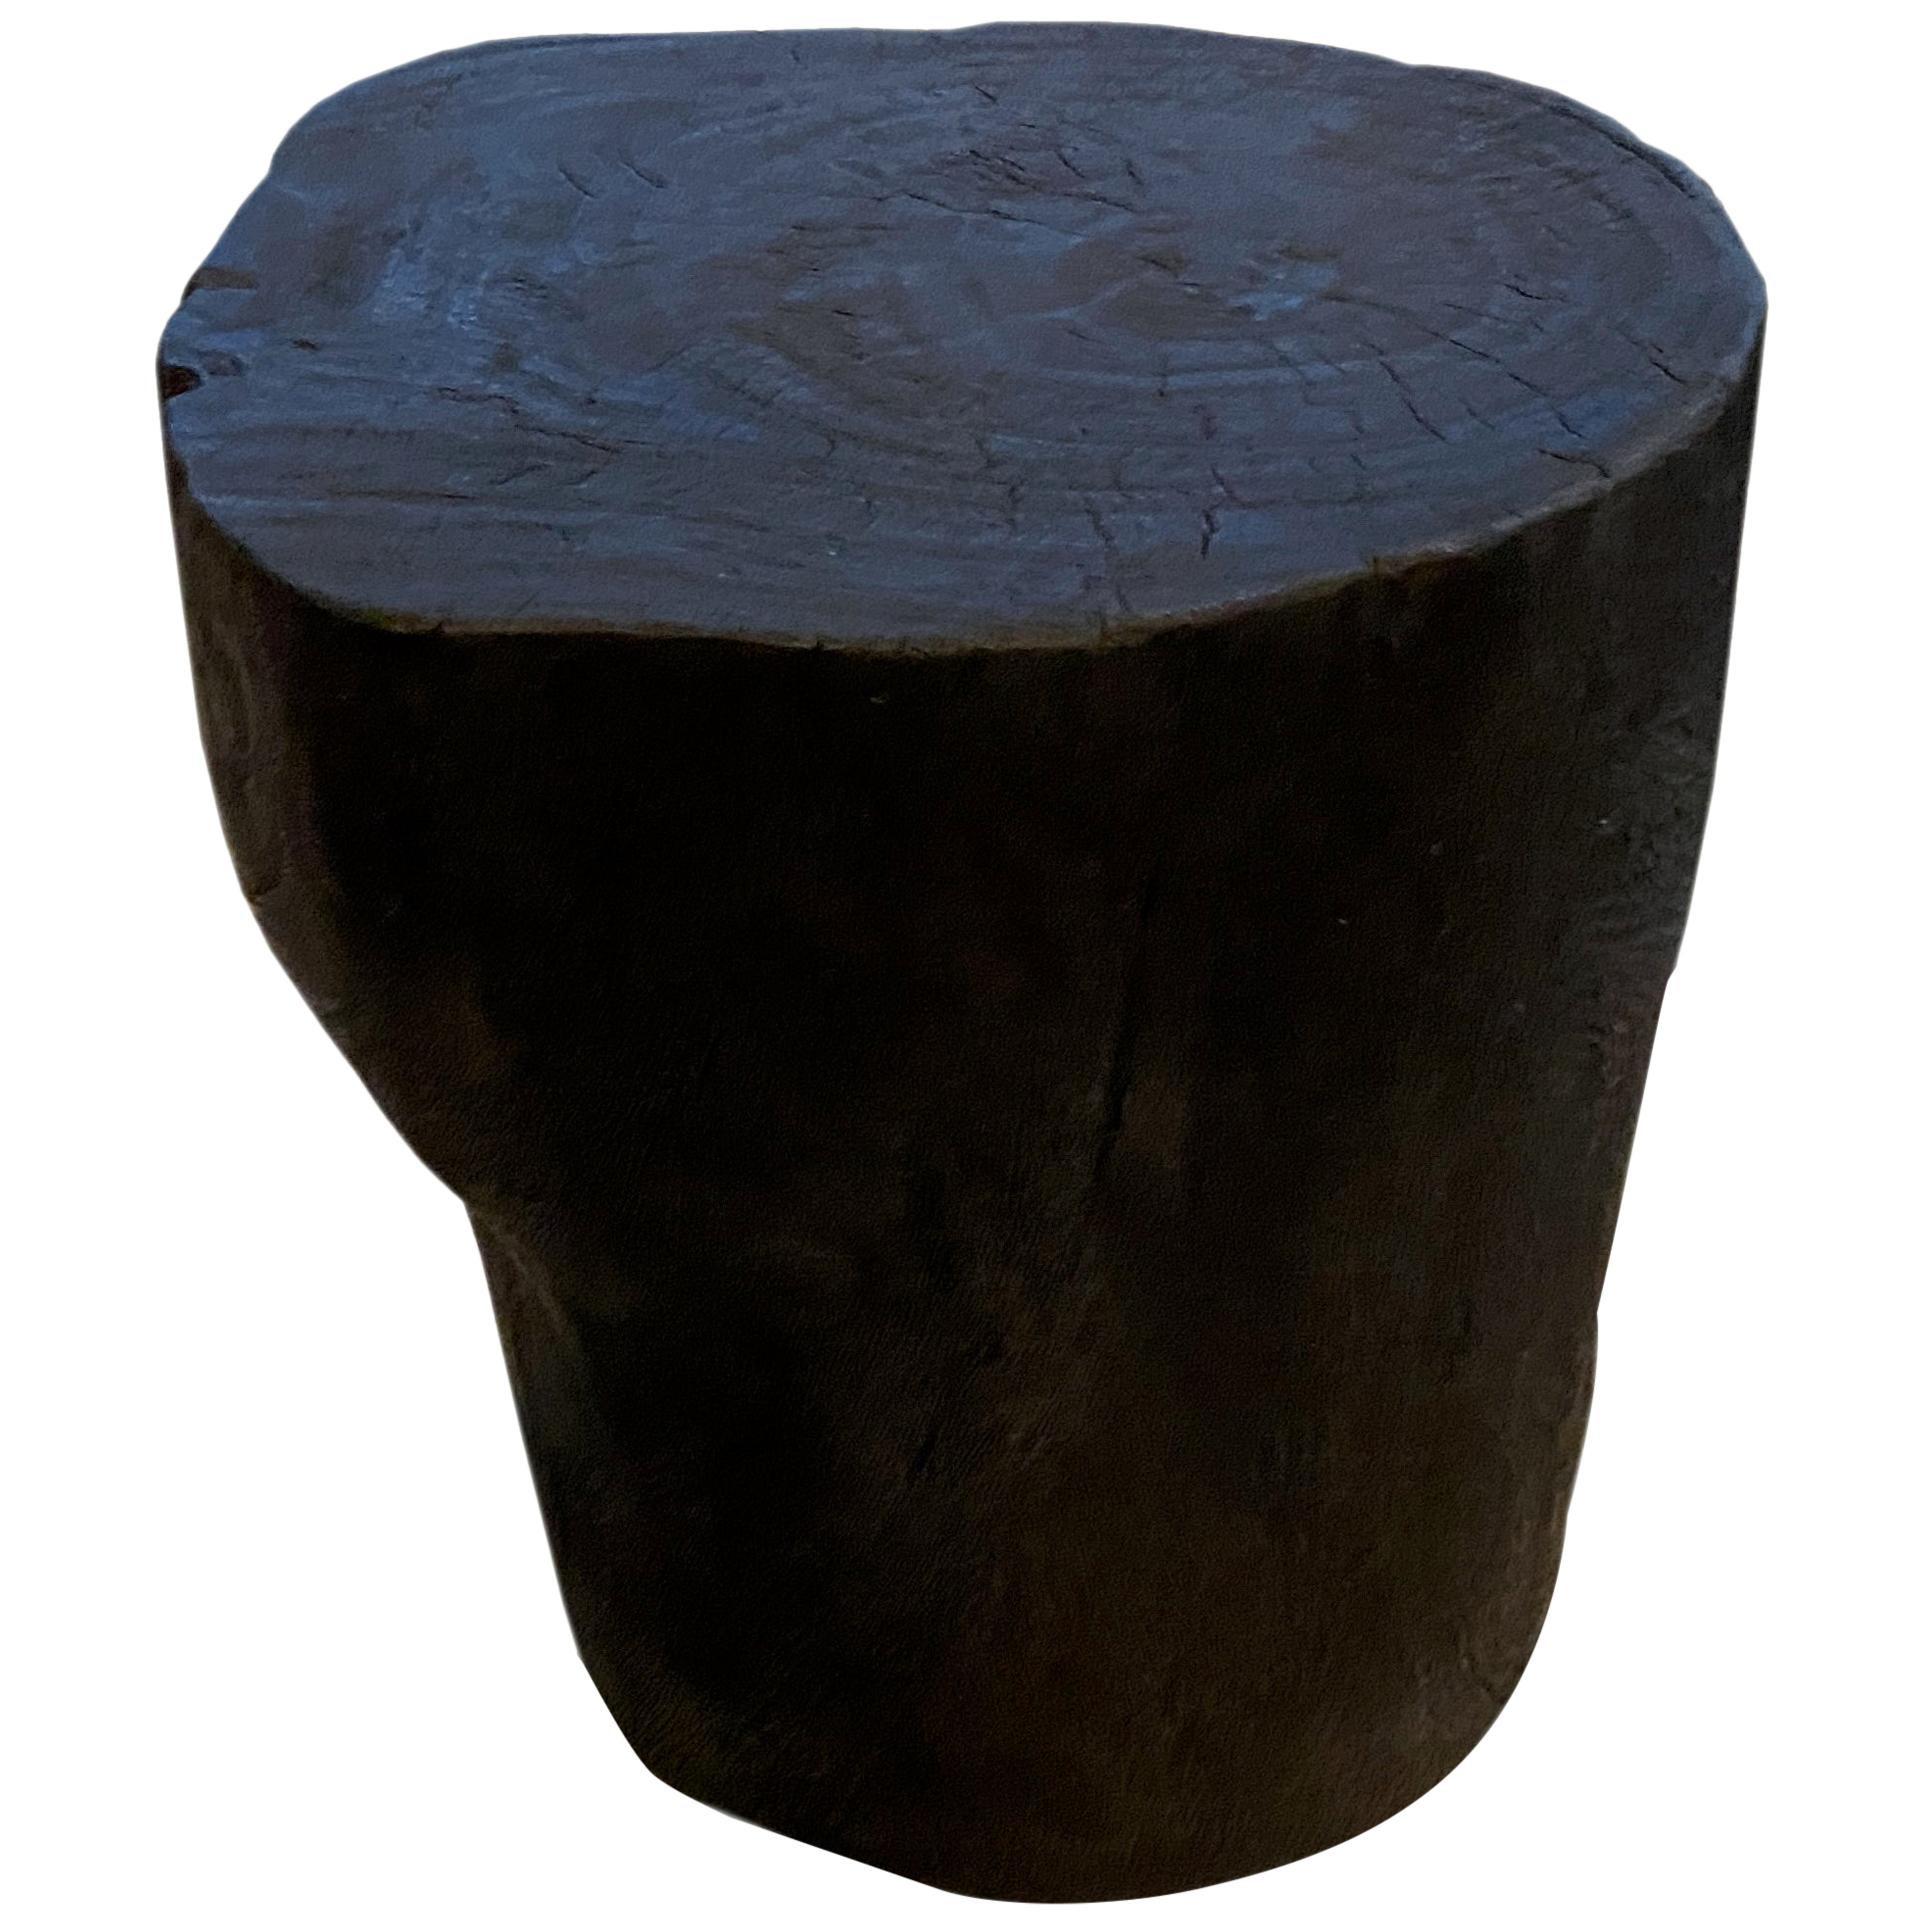 Andrianna Shamaris Charred Suar Wood Sculptural Side Table